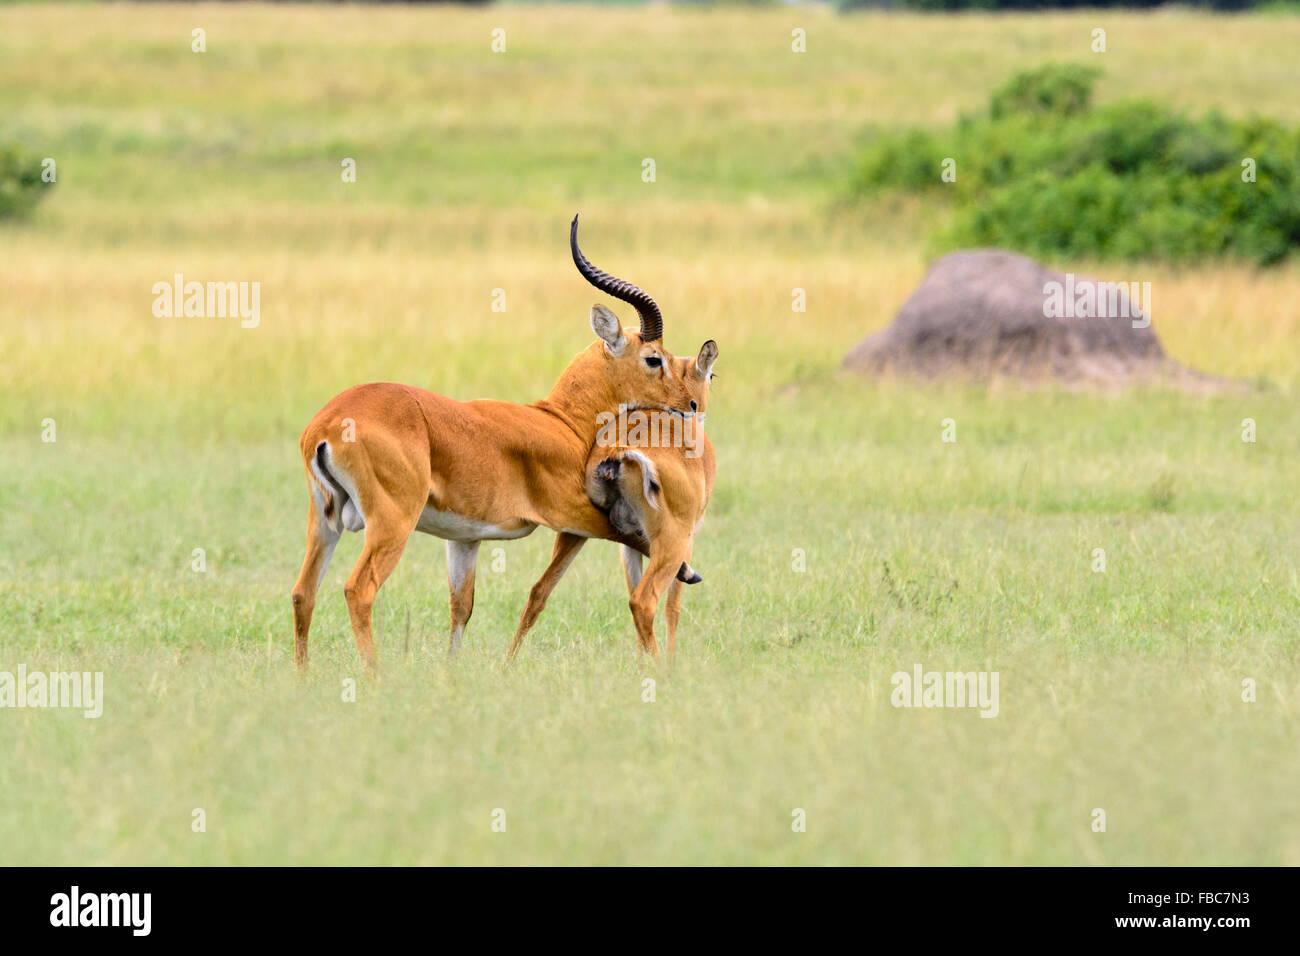 Ugandan Kob antelope during mating, Queen Elizabeth National Park, Uganda - Stock Image